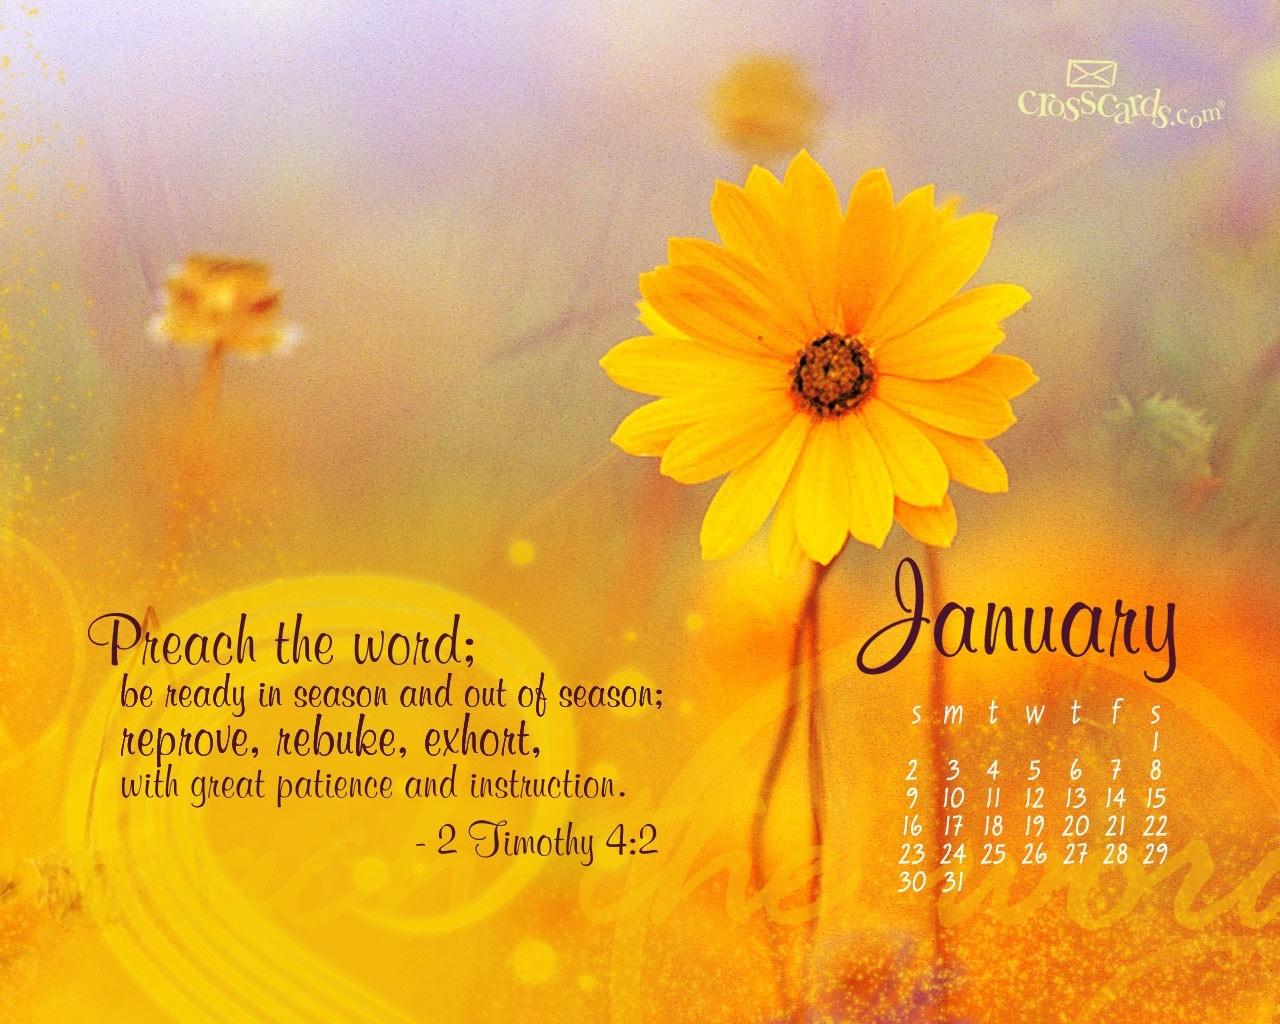 January 2011 2 Timothy 42 Desktop Calendar Free January Wallpaper3abry